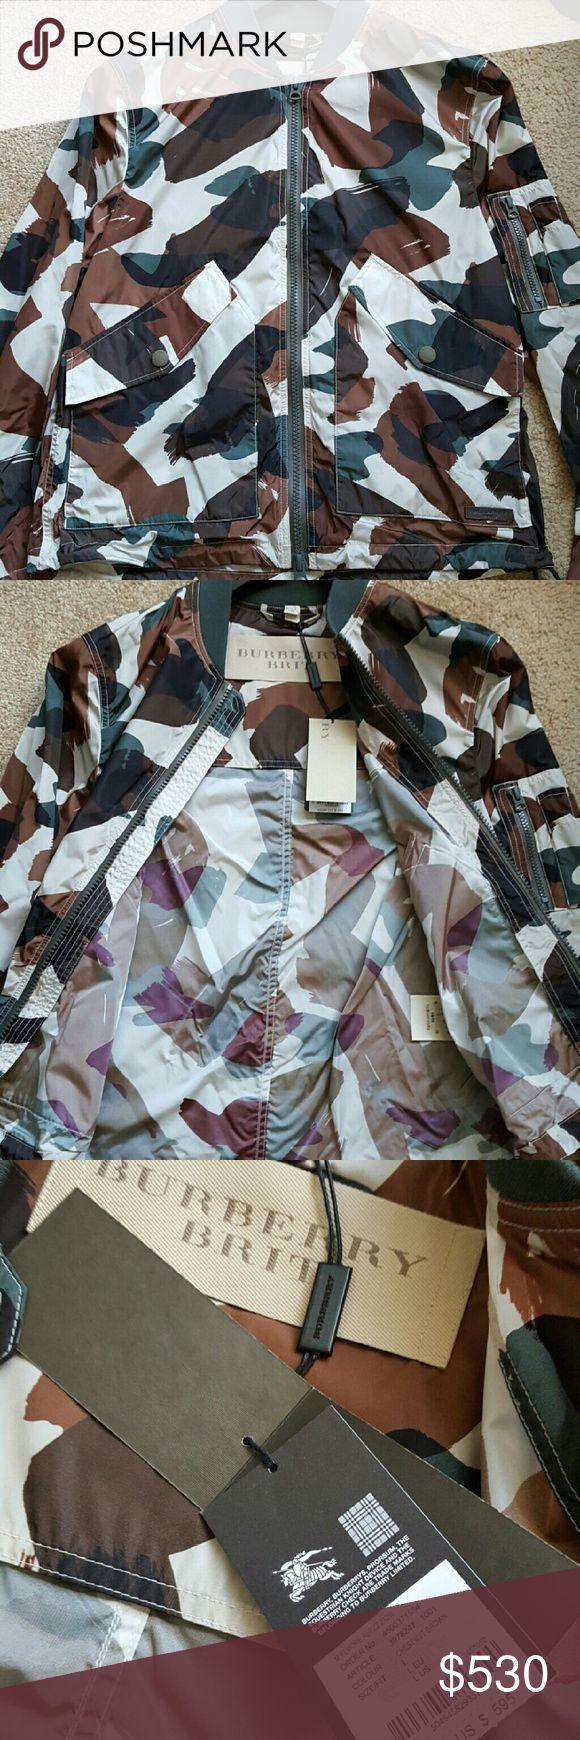 Burberry Bomber Bomber jacket. Never been worn still has tags on. Last  seen for $601 on Harrods.com. Burberry Jackets & Coats Bomber & Varsity